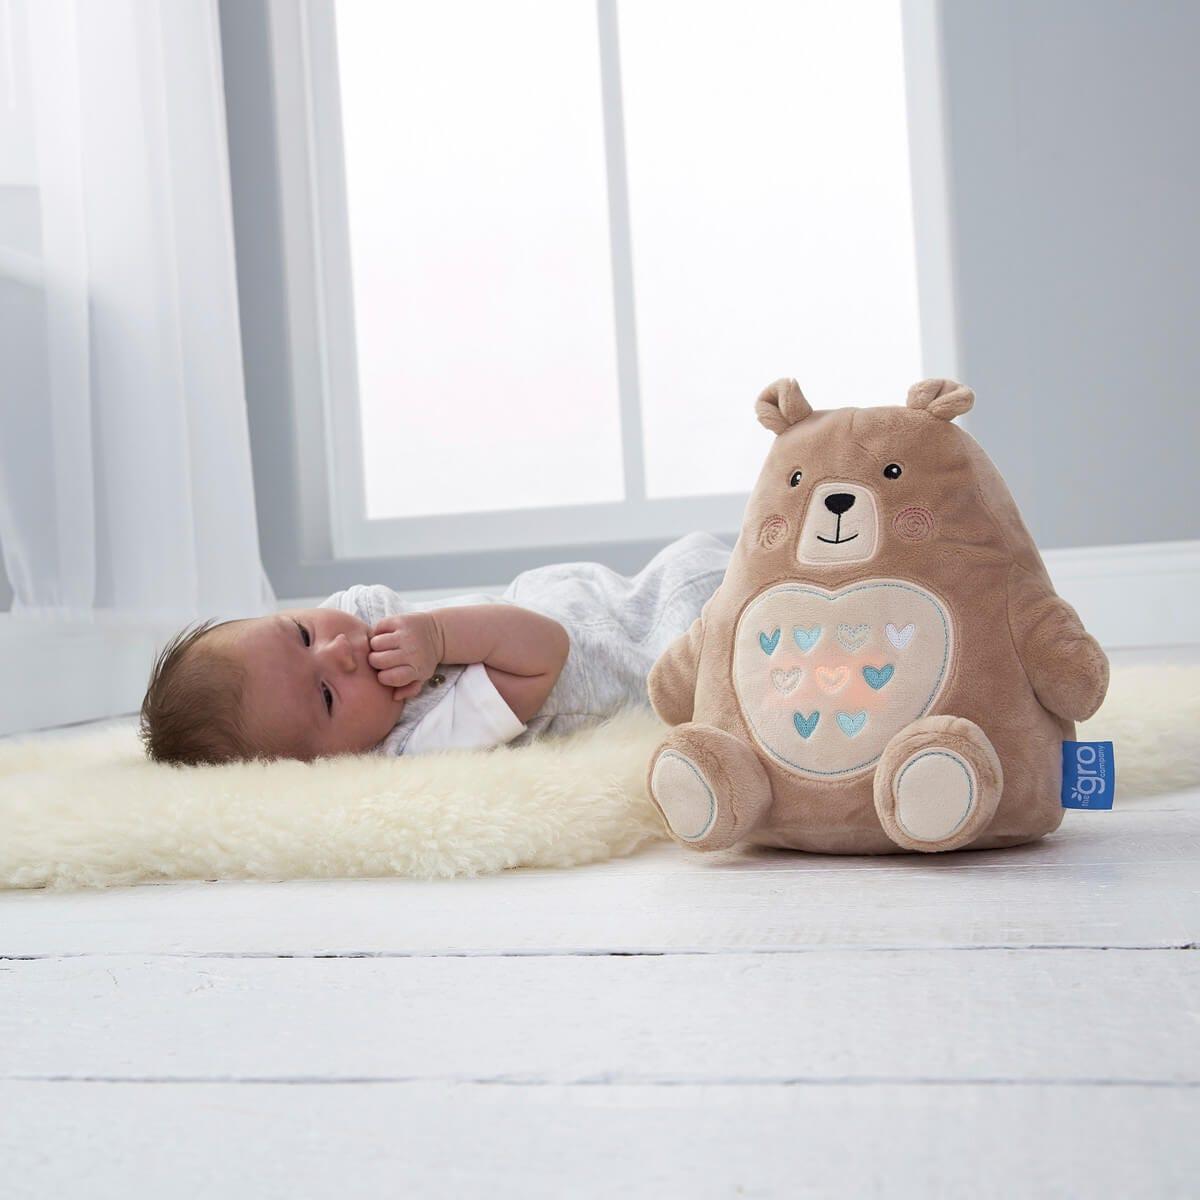 baby-lying-on-fur-rug-next-to-bennie-the-bear-grofriend